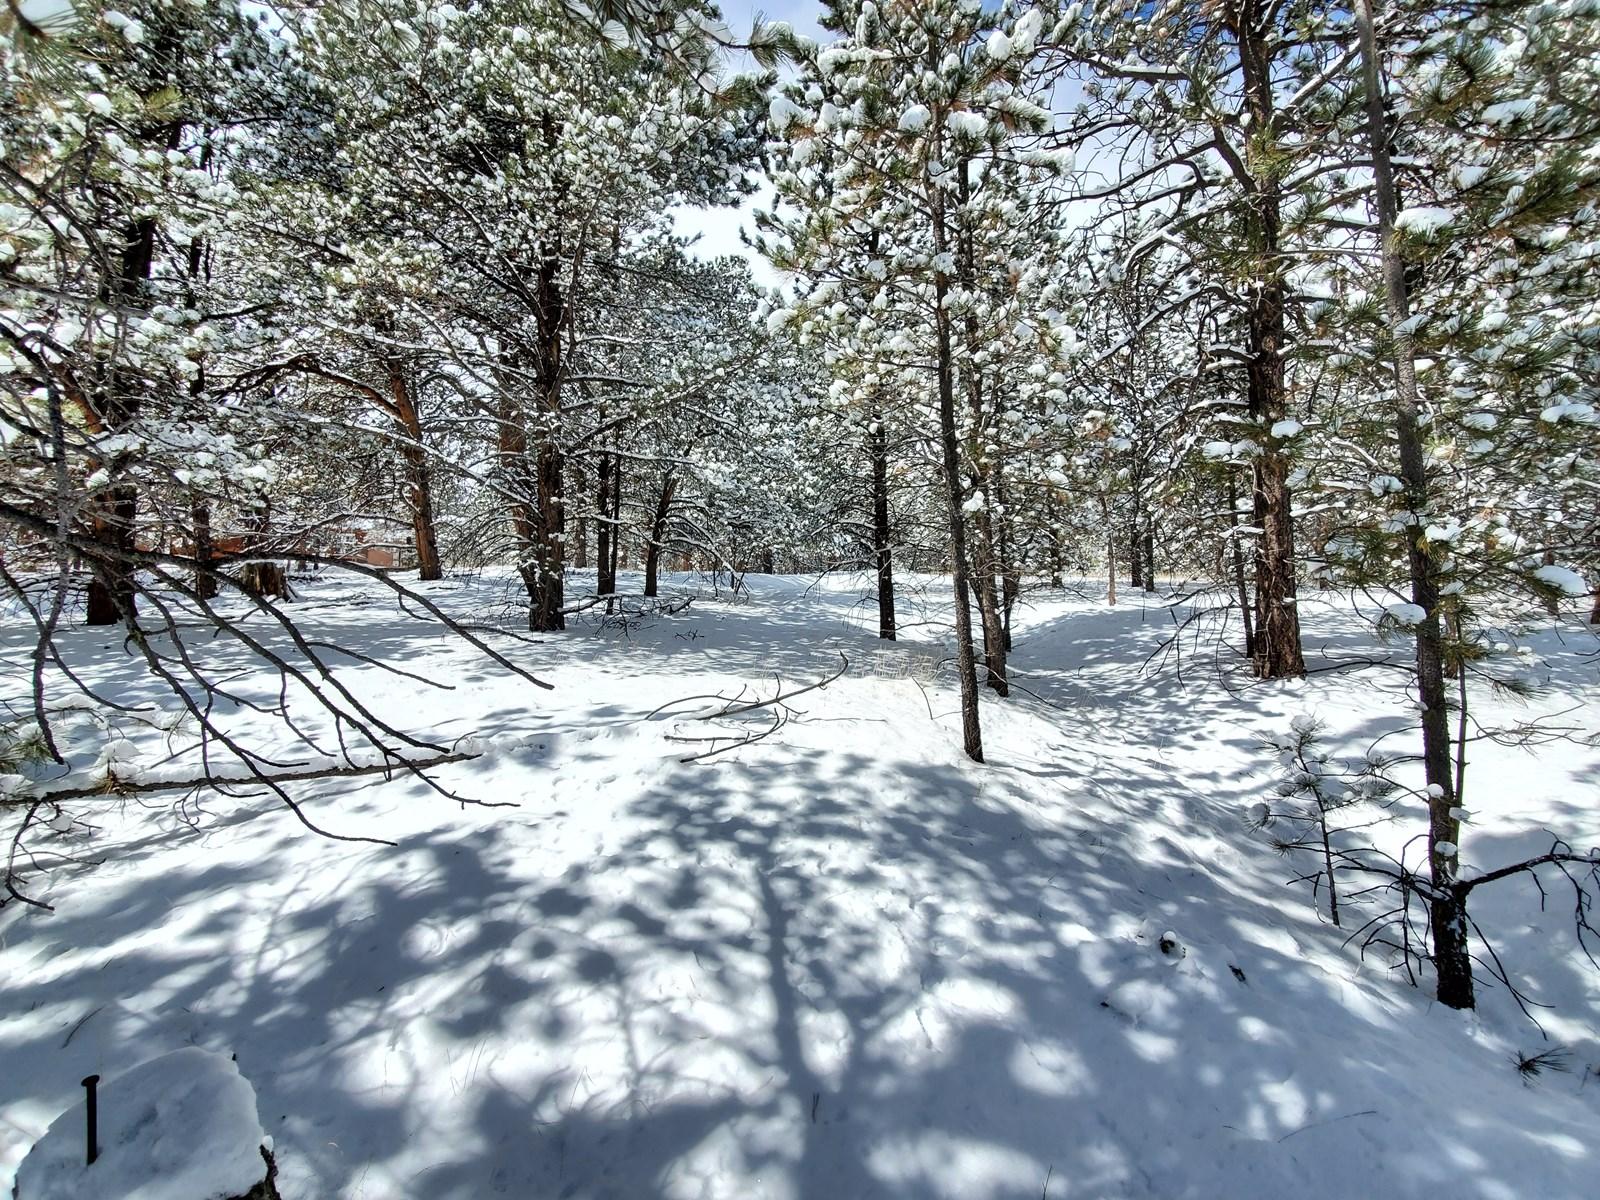 Vacant Land for Sale near Mueller State Park, Florissant, CO